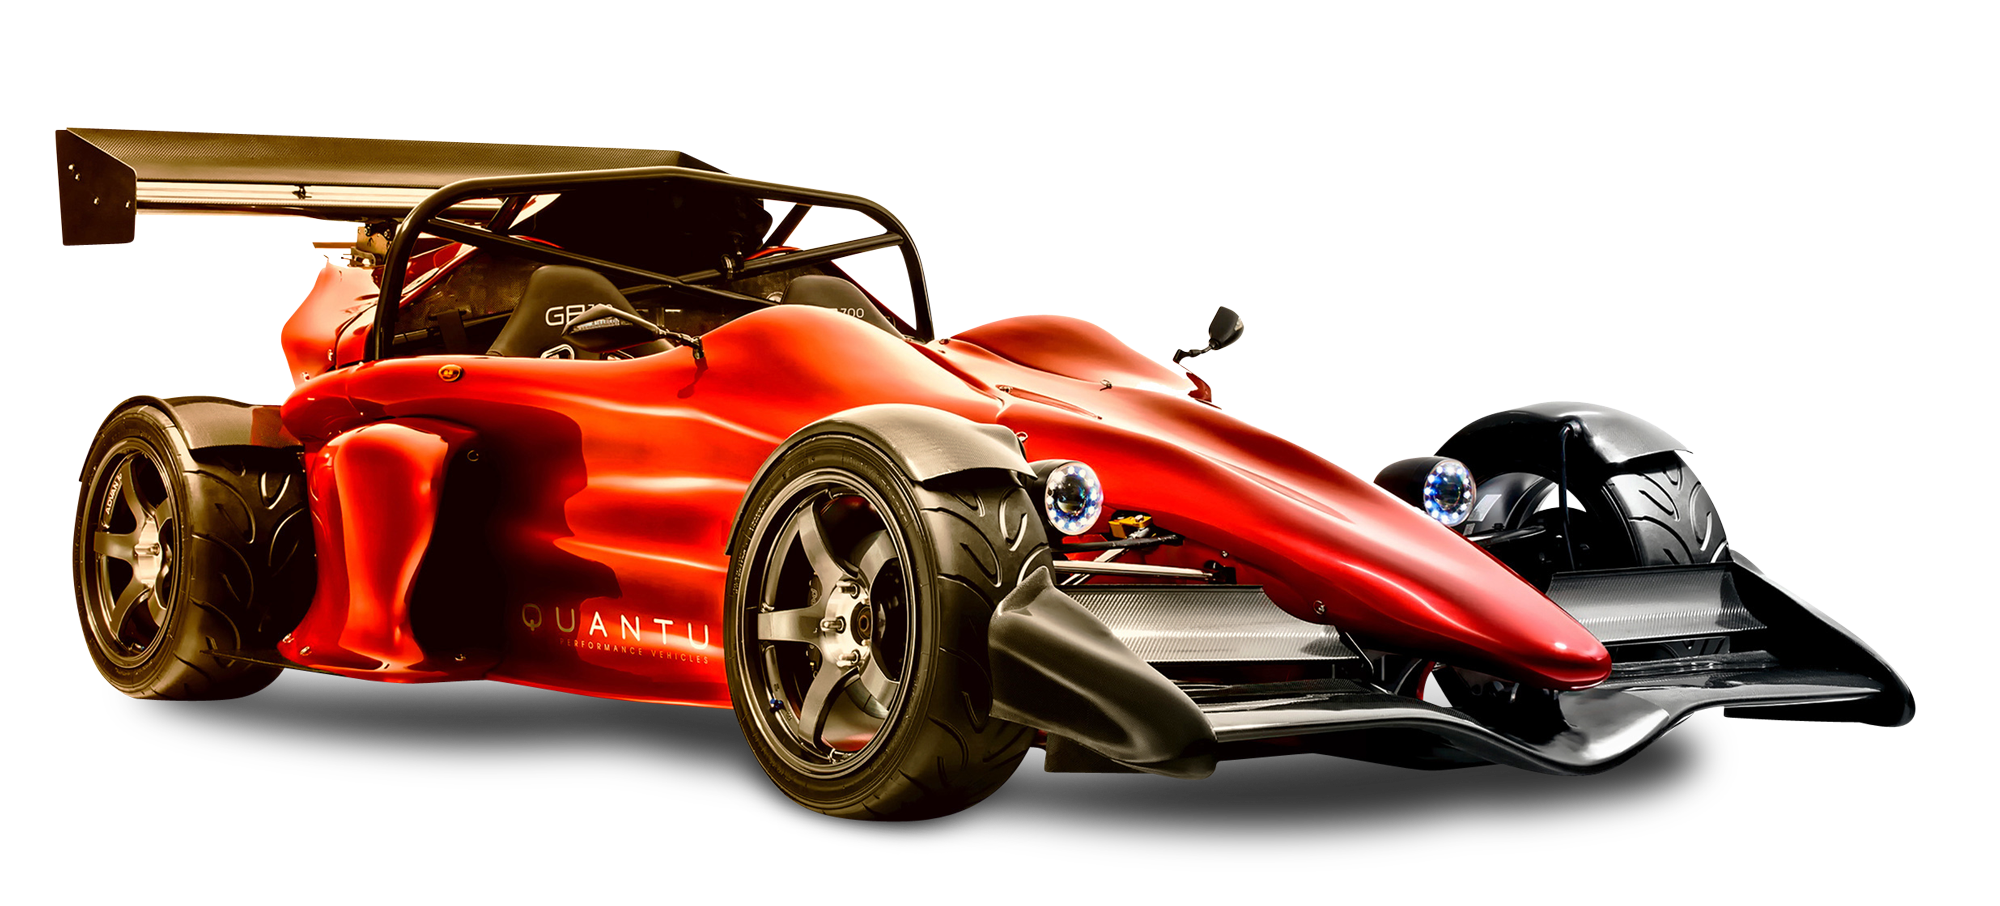 Quantum GP700 Race Car PNG Image